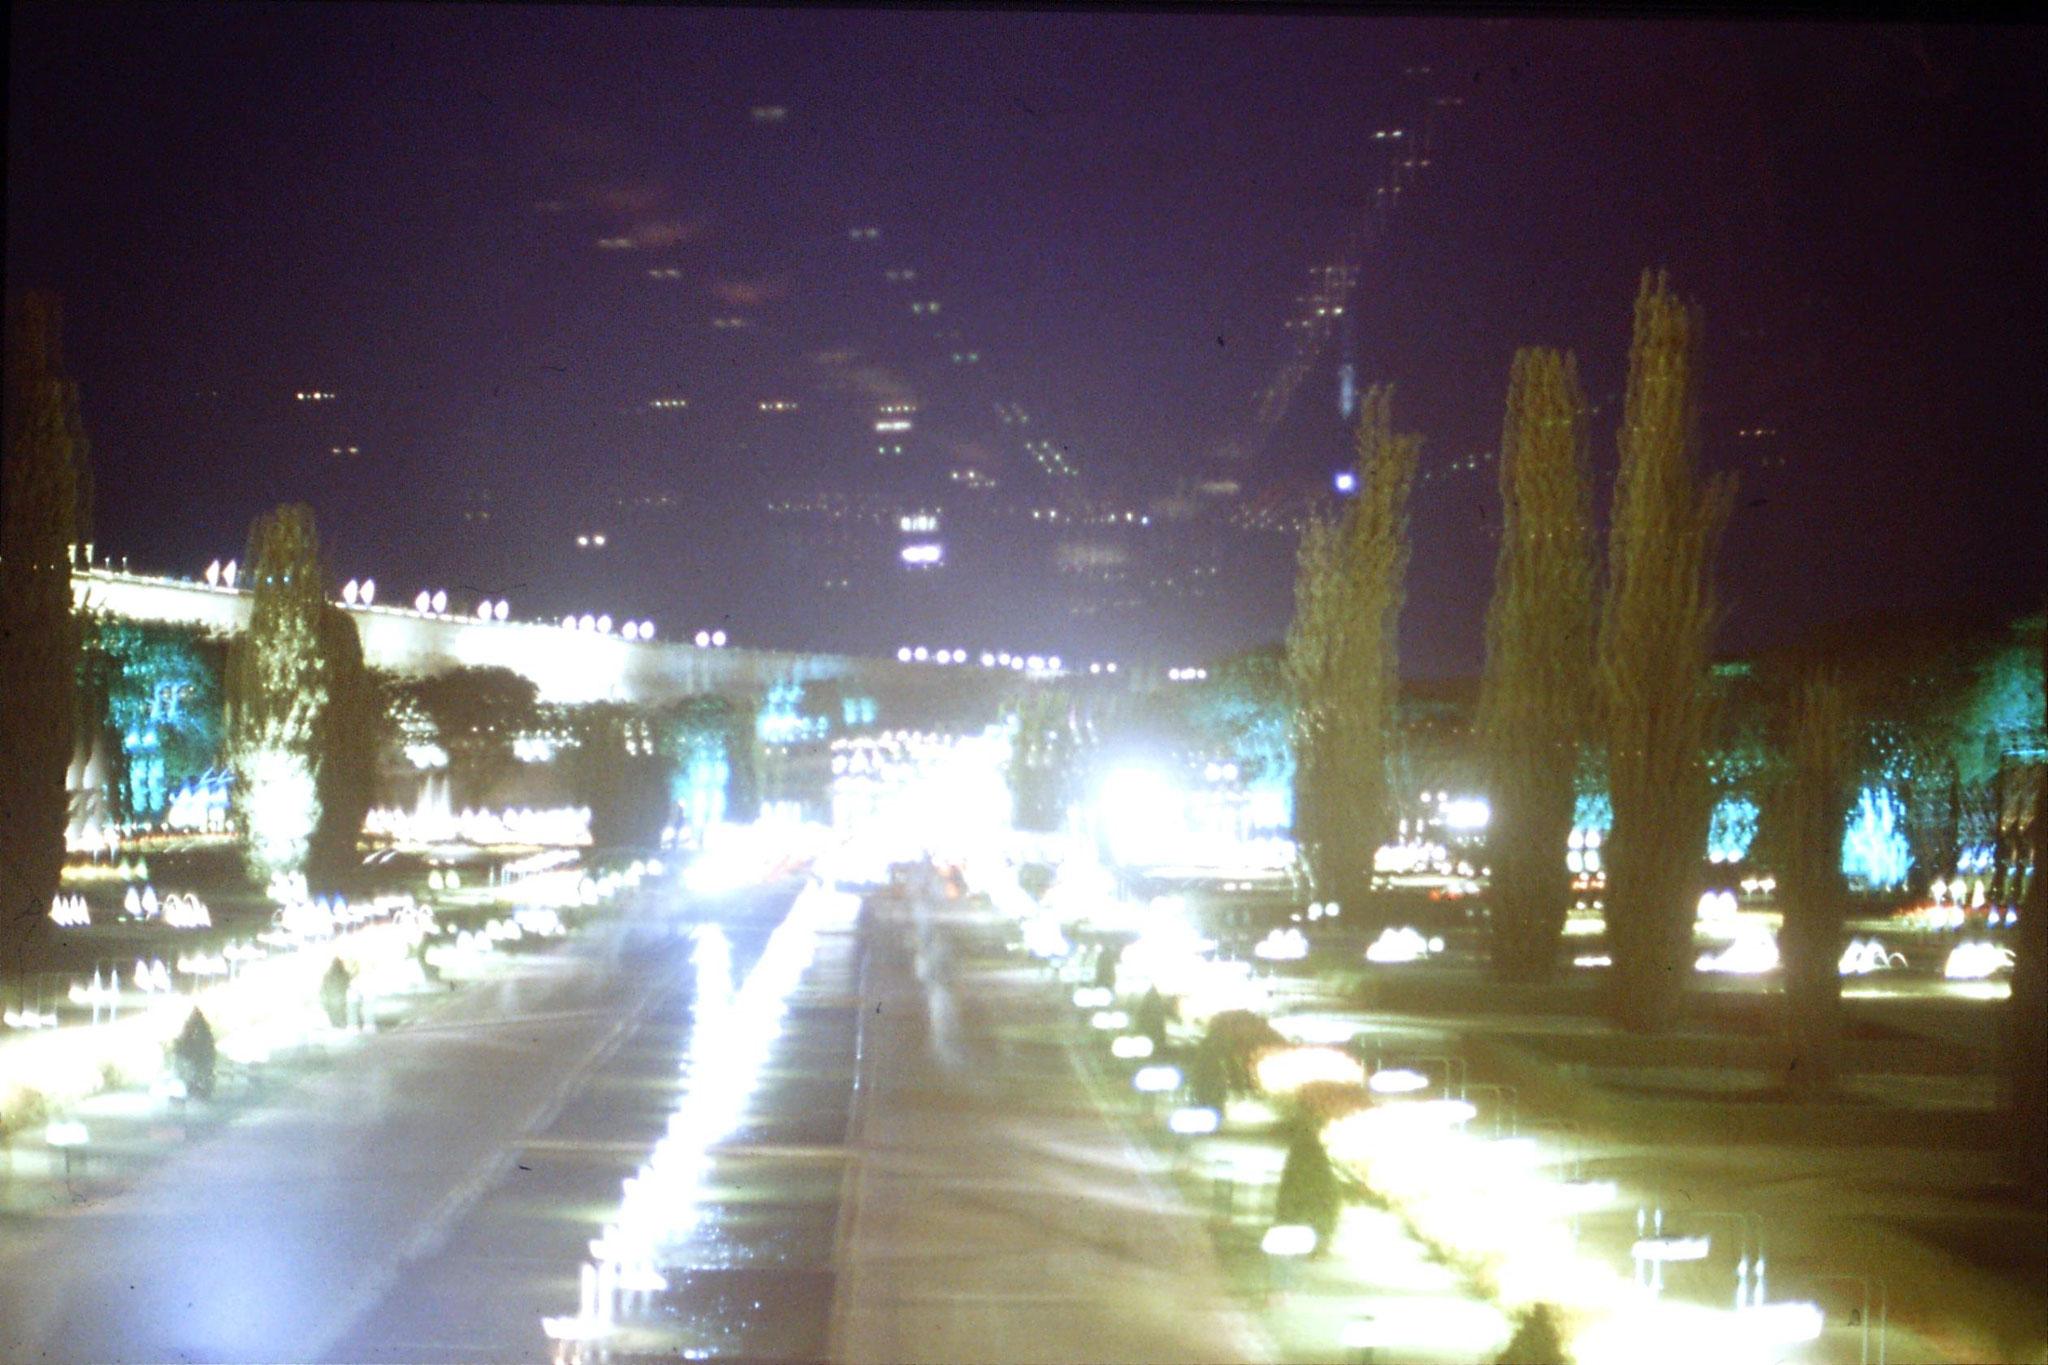 108/10: 12/3/1990 Brindavan Garden at night (60 secs) flash